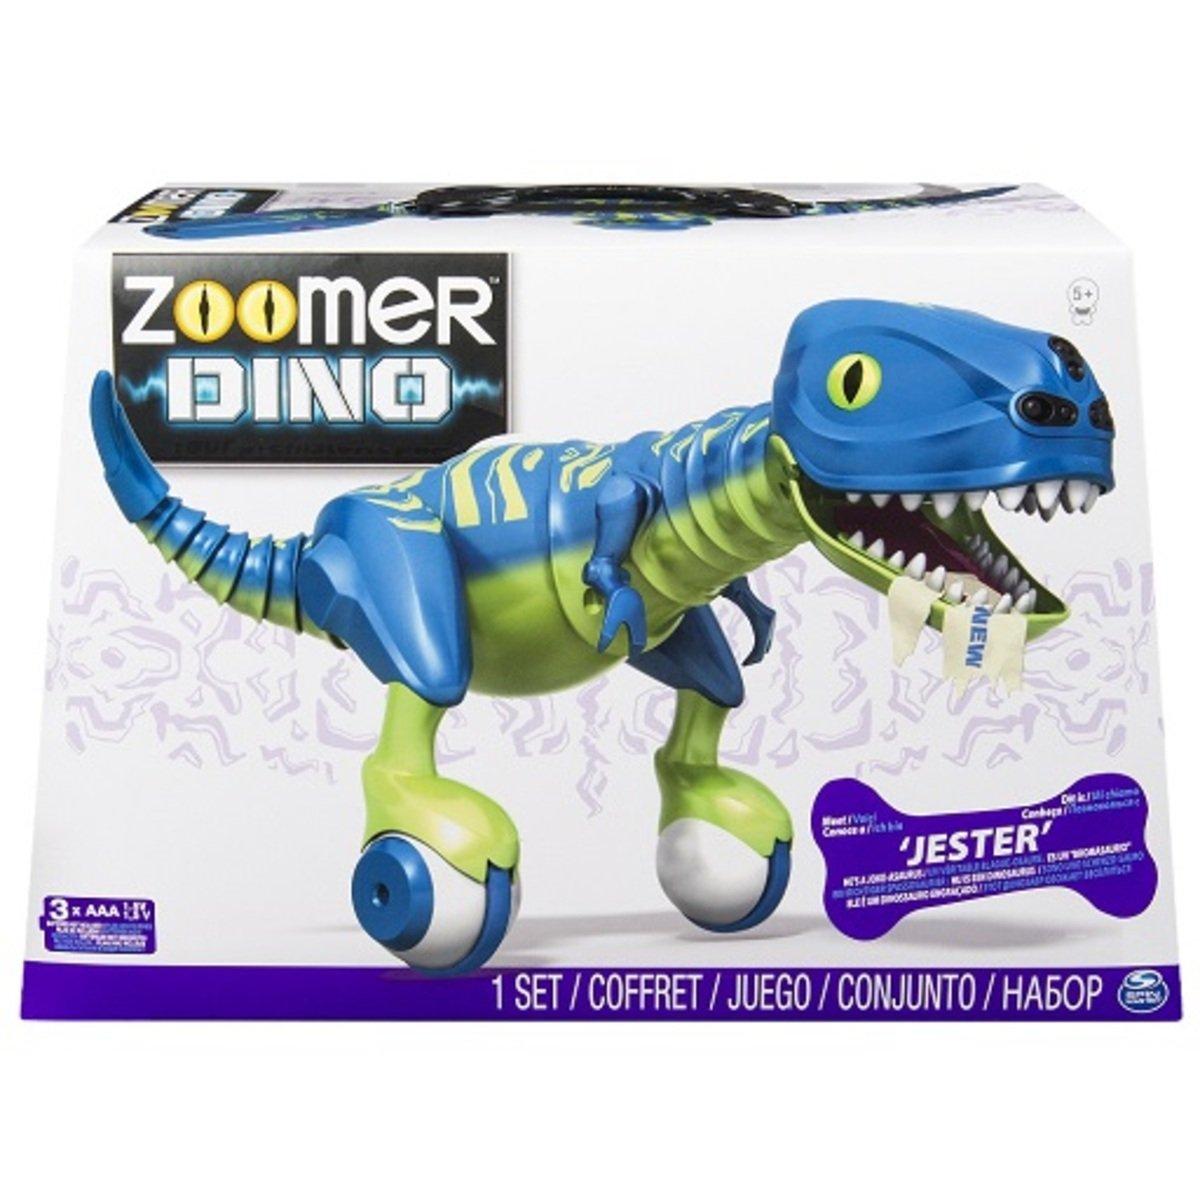 Zoomer 恐龍- Jester